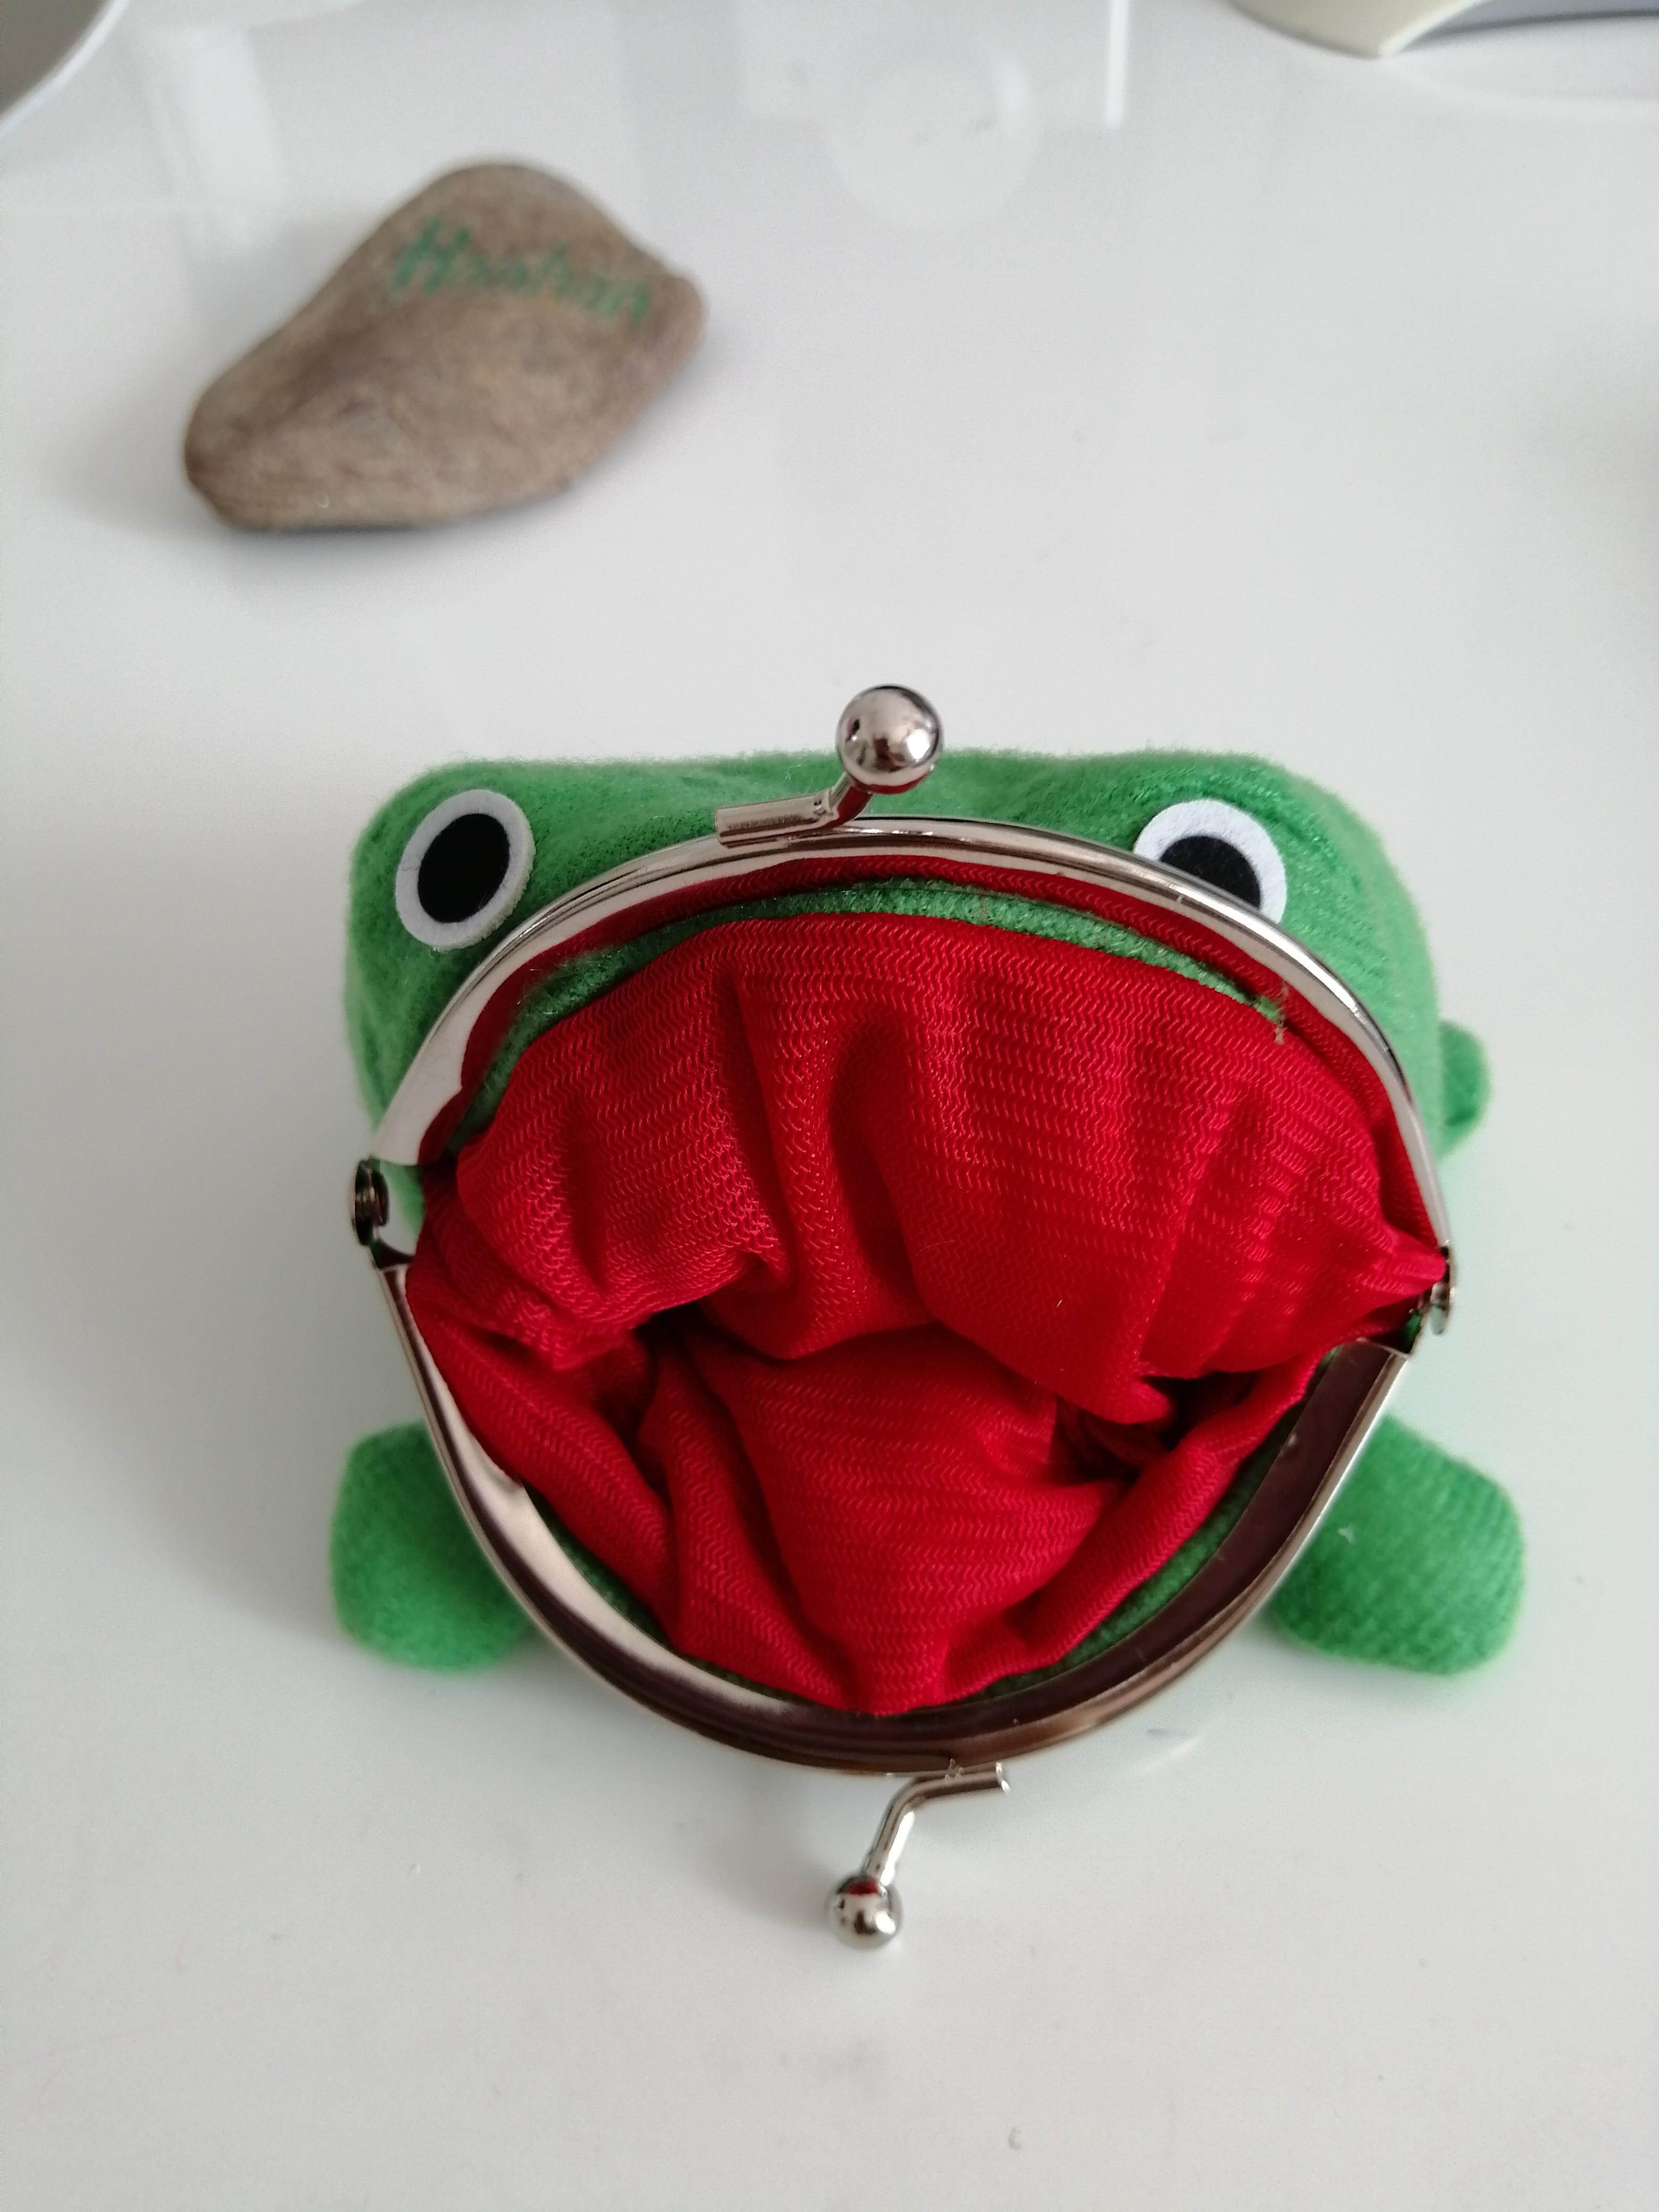 Anime Cartoon Naruto Purse Wallet Coin Purse Originality Frog Wallet Manga Flannel Wallet Cheap Cute Purse